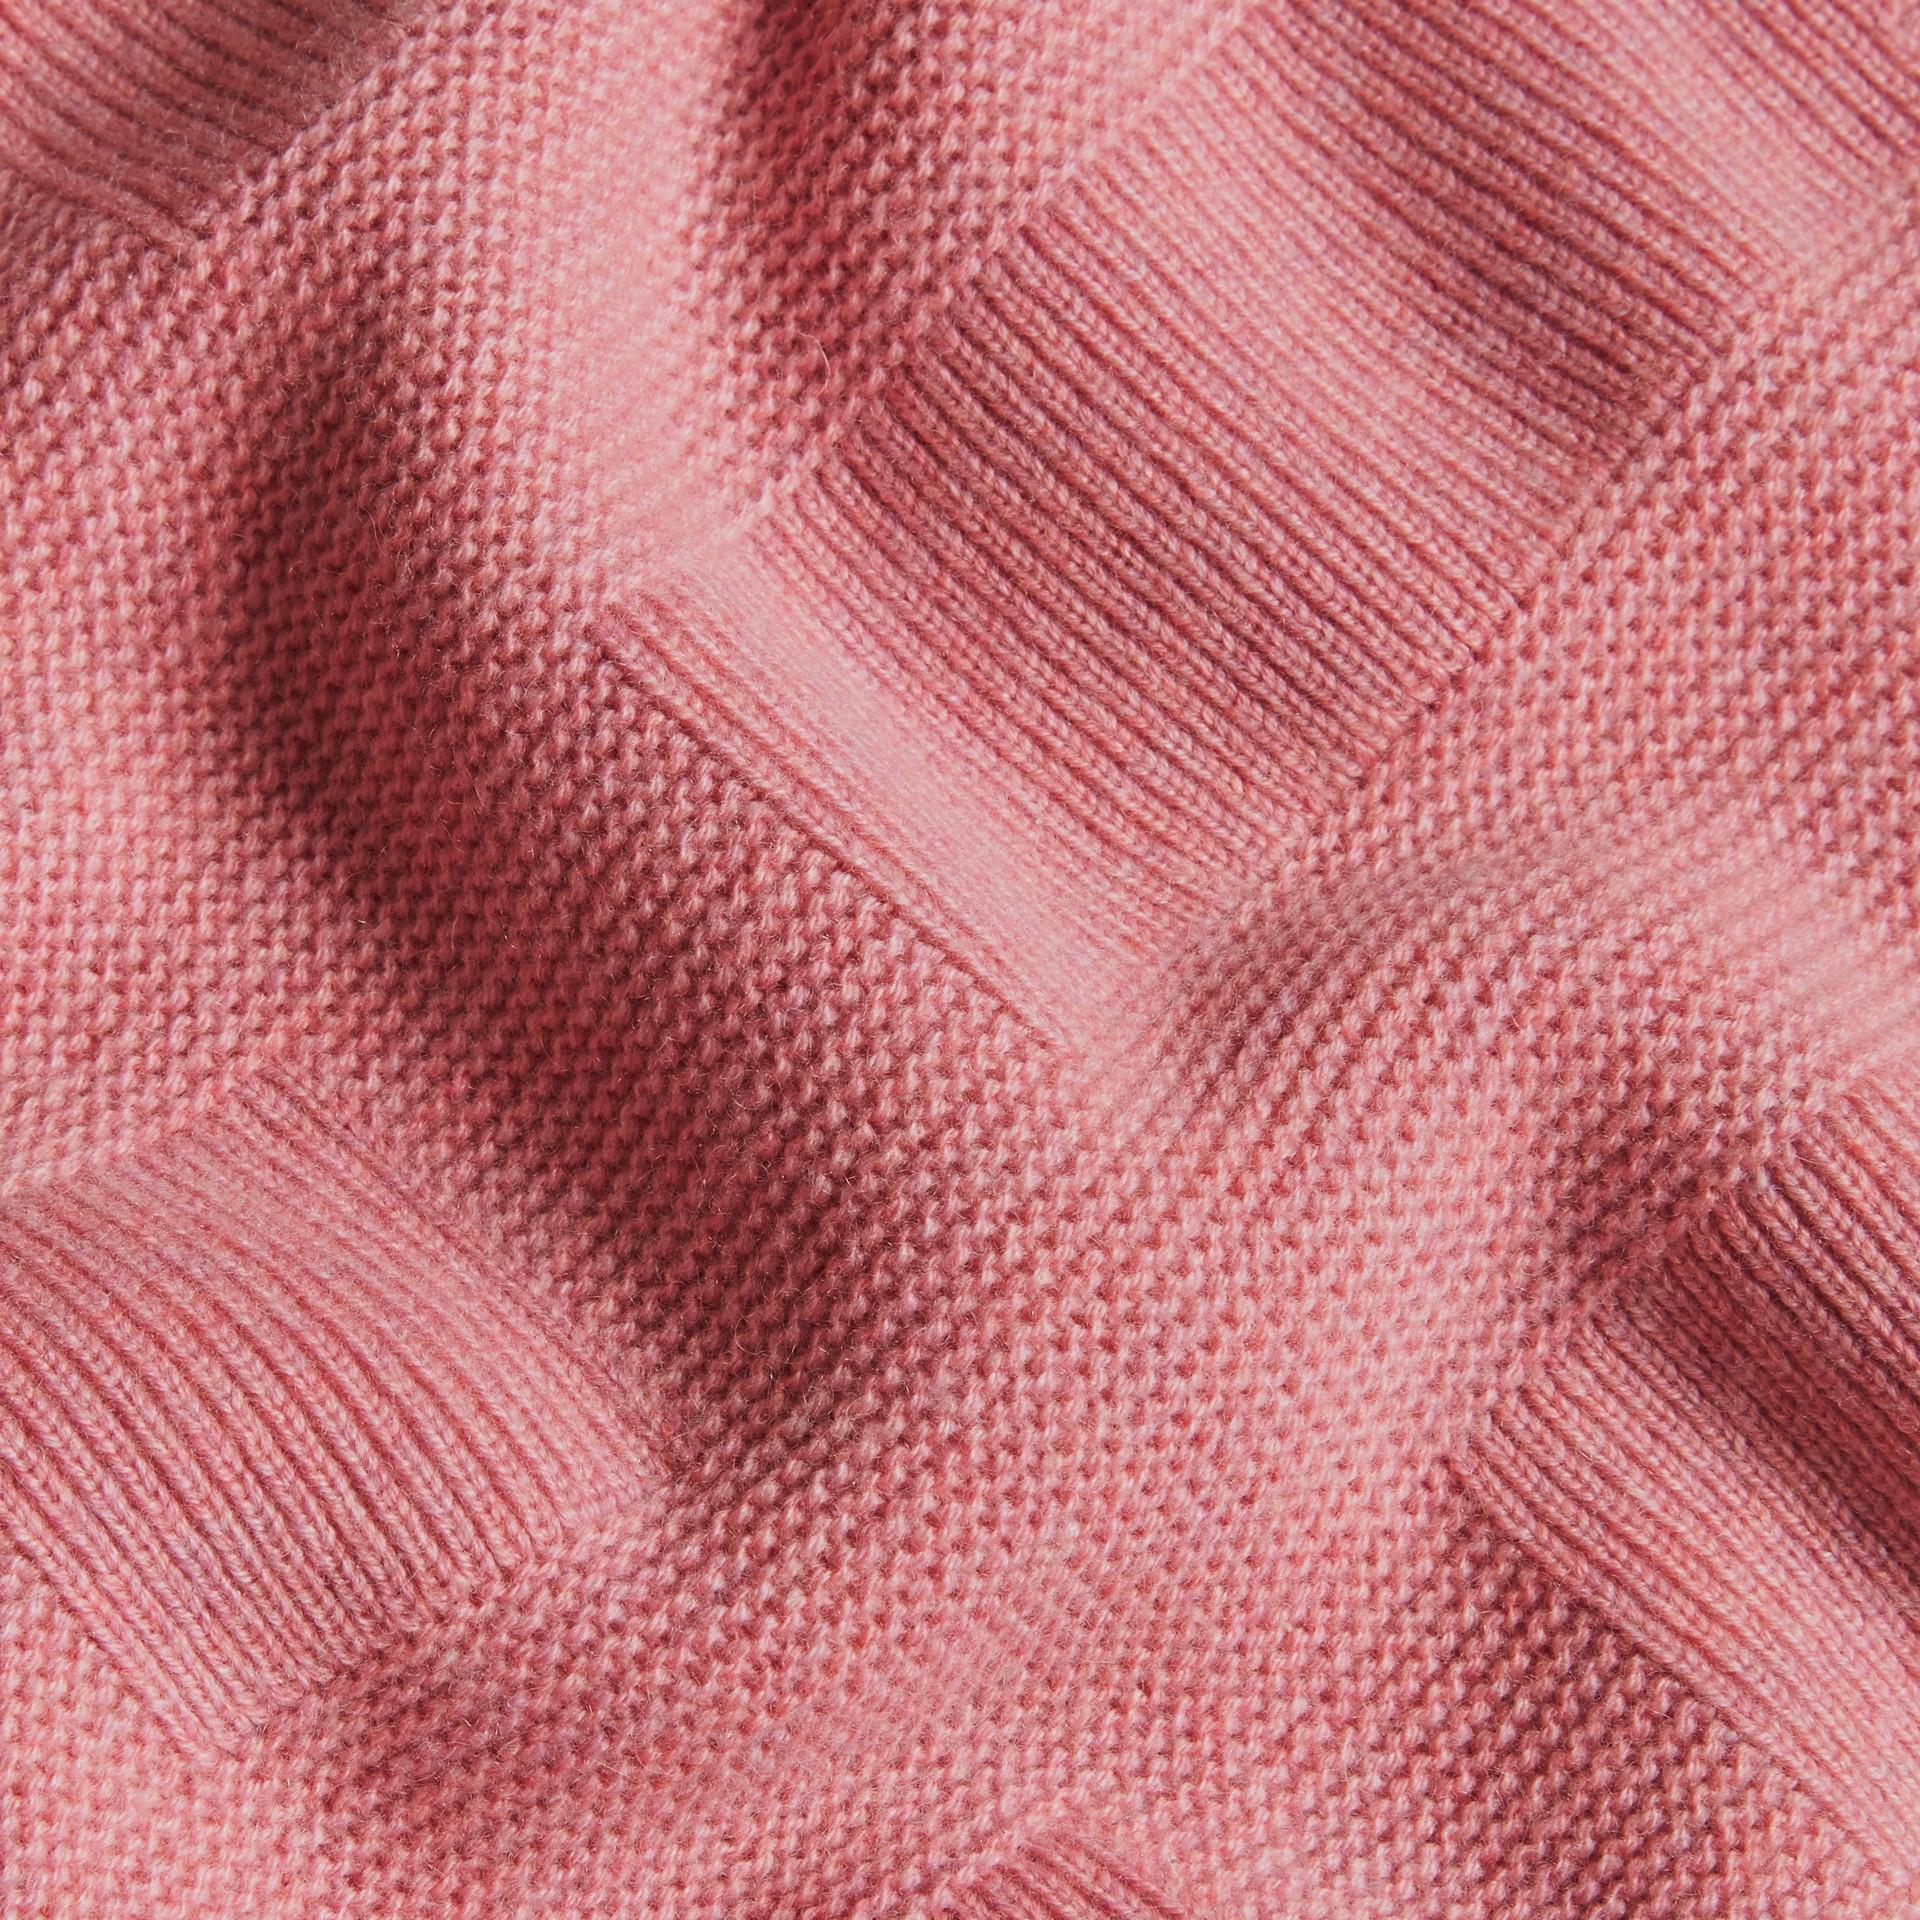 Hydrangea pink melange Check-knit Wool Cashmere Sweater Hydrangea Pink Melange - gallery image 2